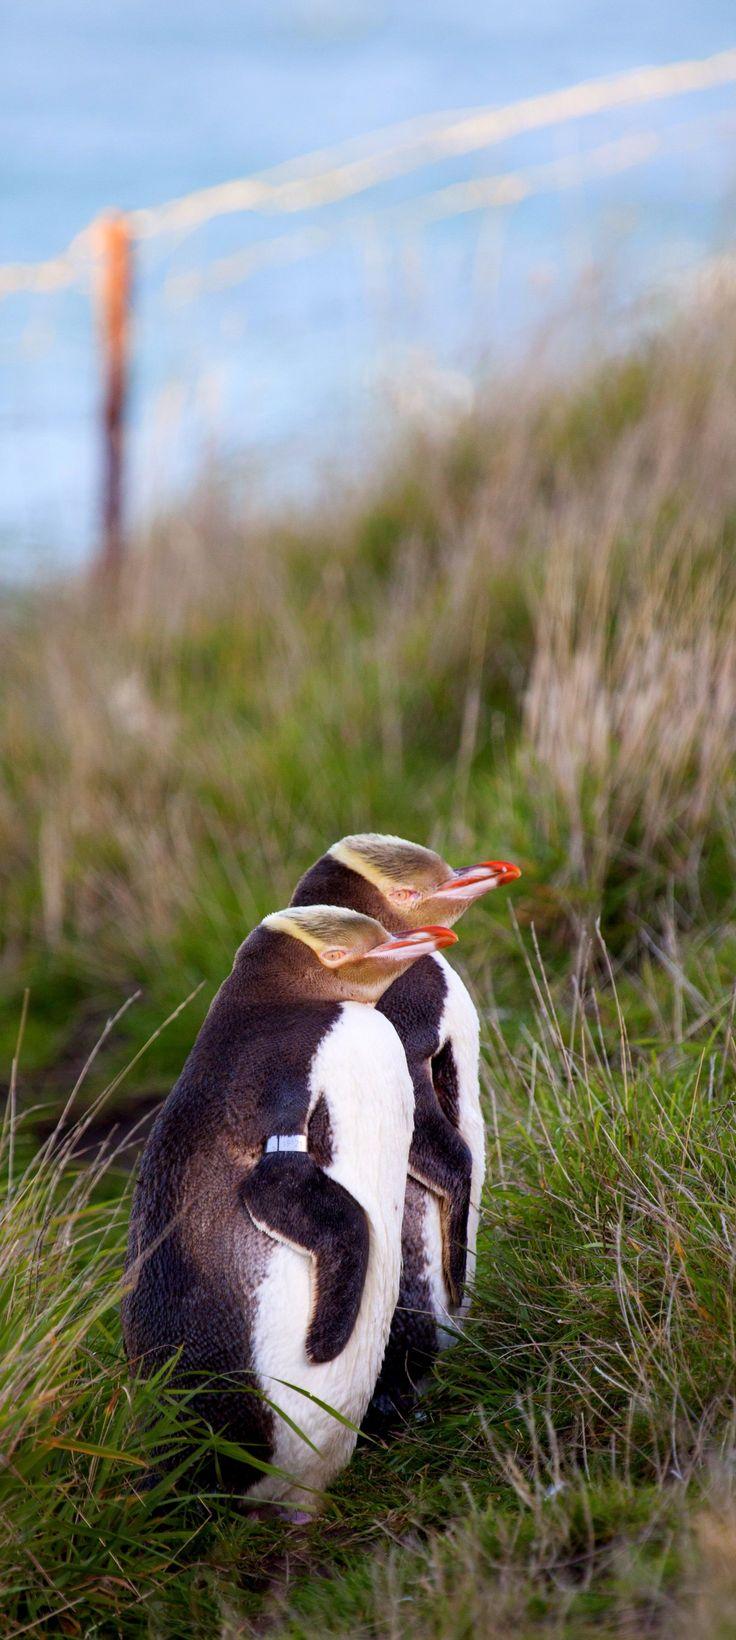 Visiting Penguins in Waitaki, New Zealand.